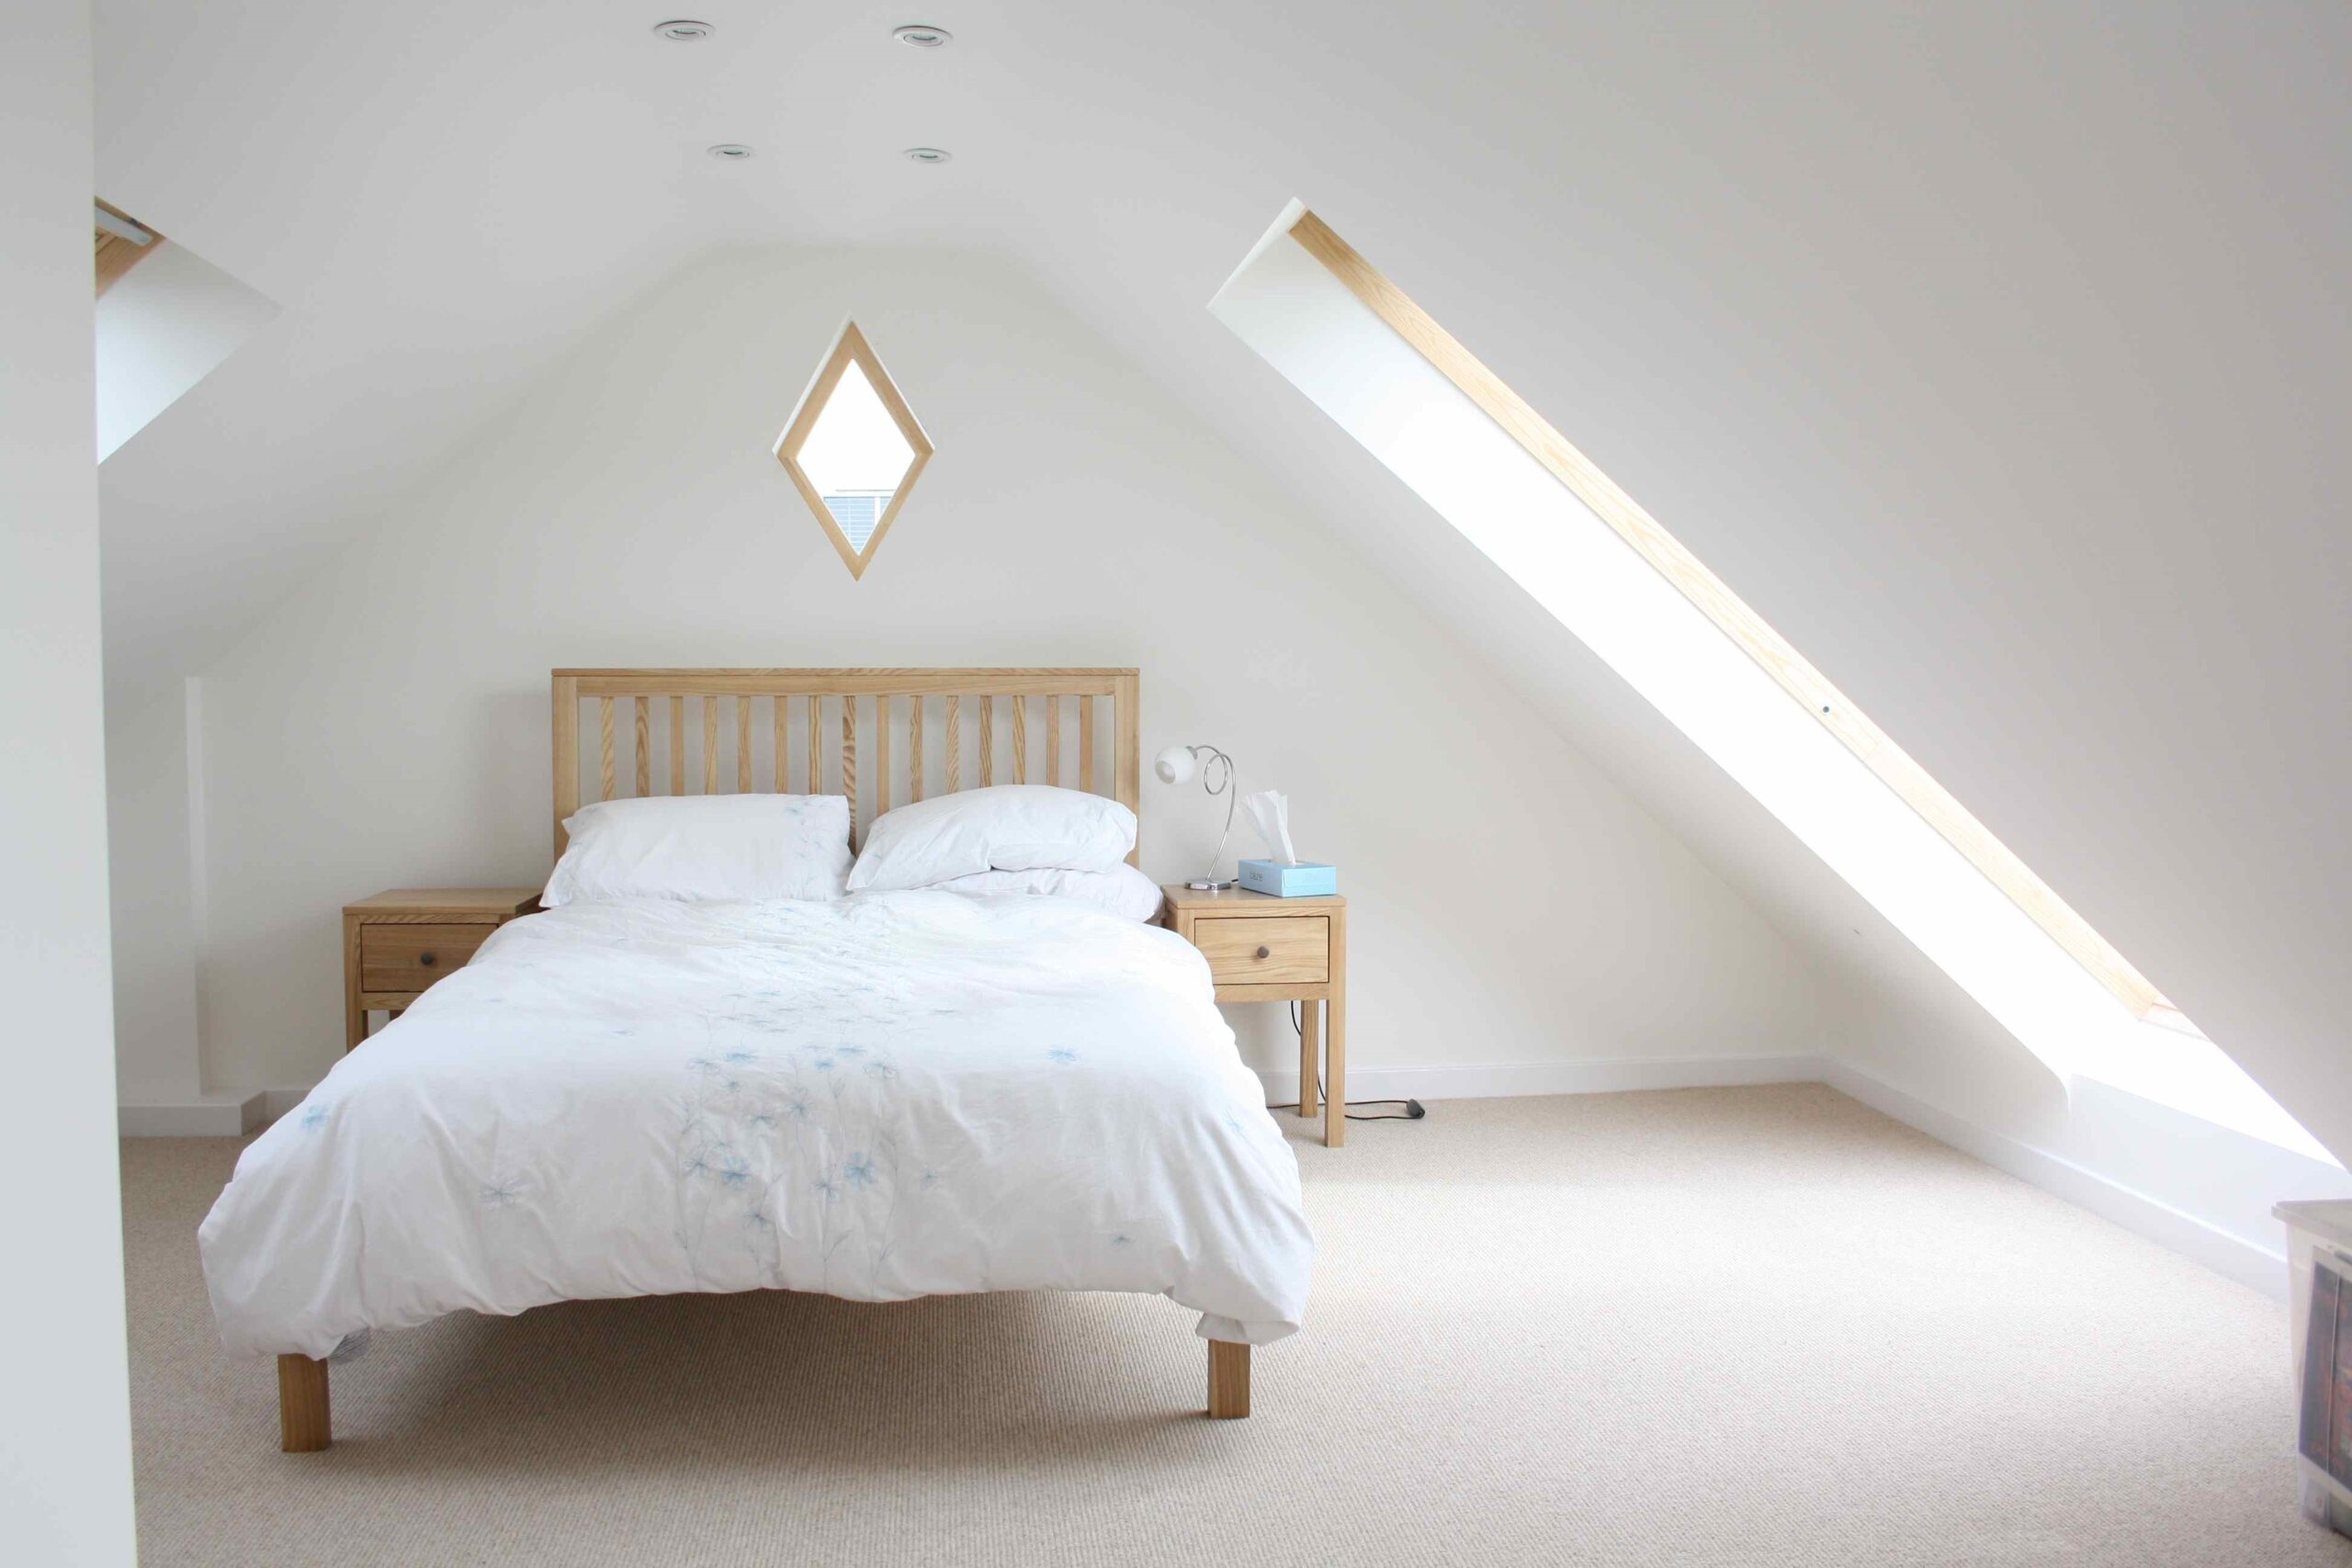 Velux Loft Conversion | Simple Skylight Loft Conversions ...